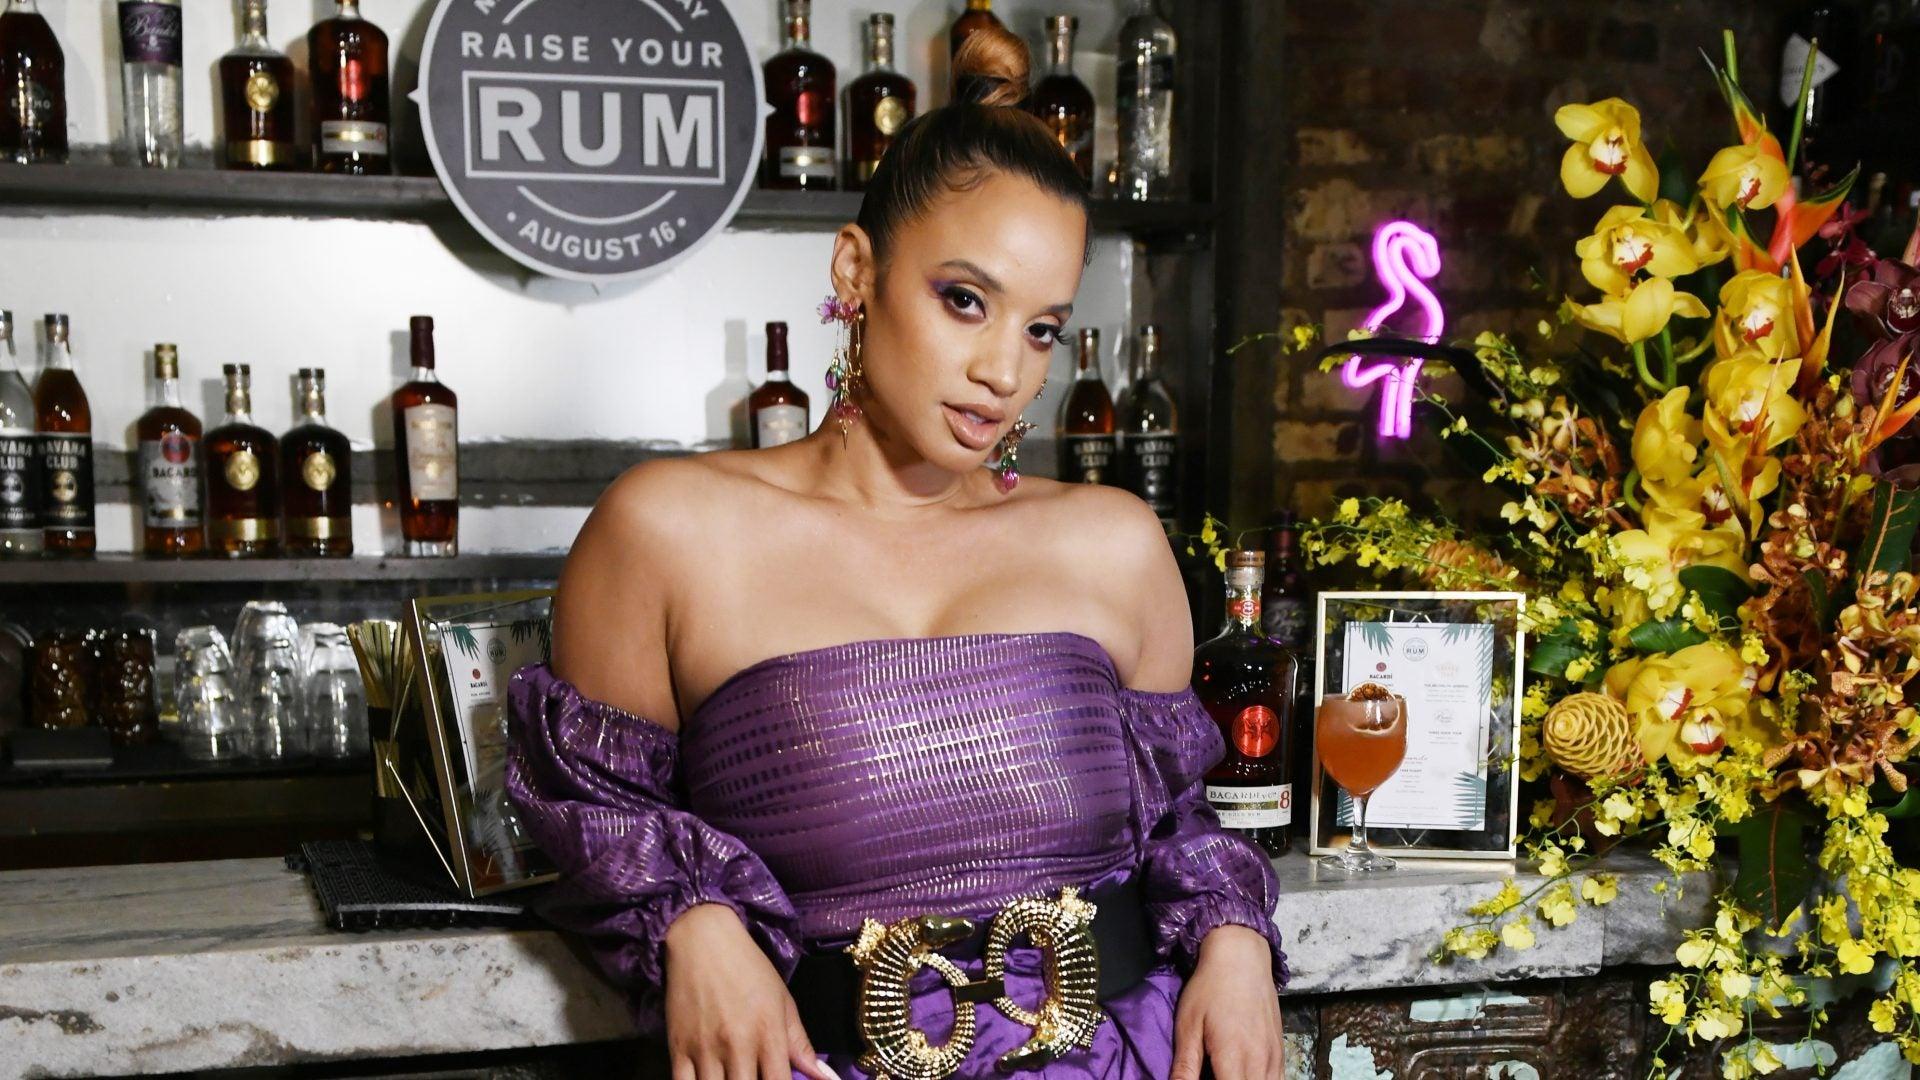 How 'OITNB' Star Dascha Polanco Stays Confident